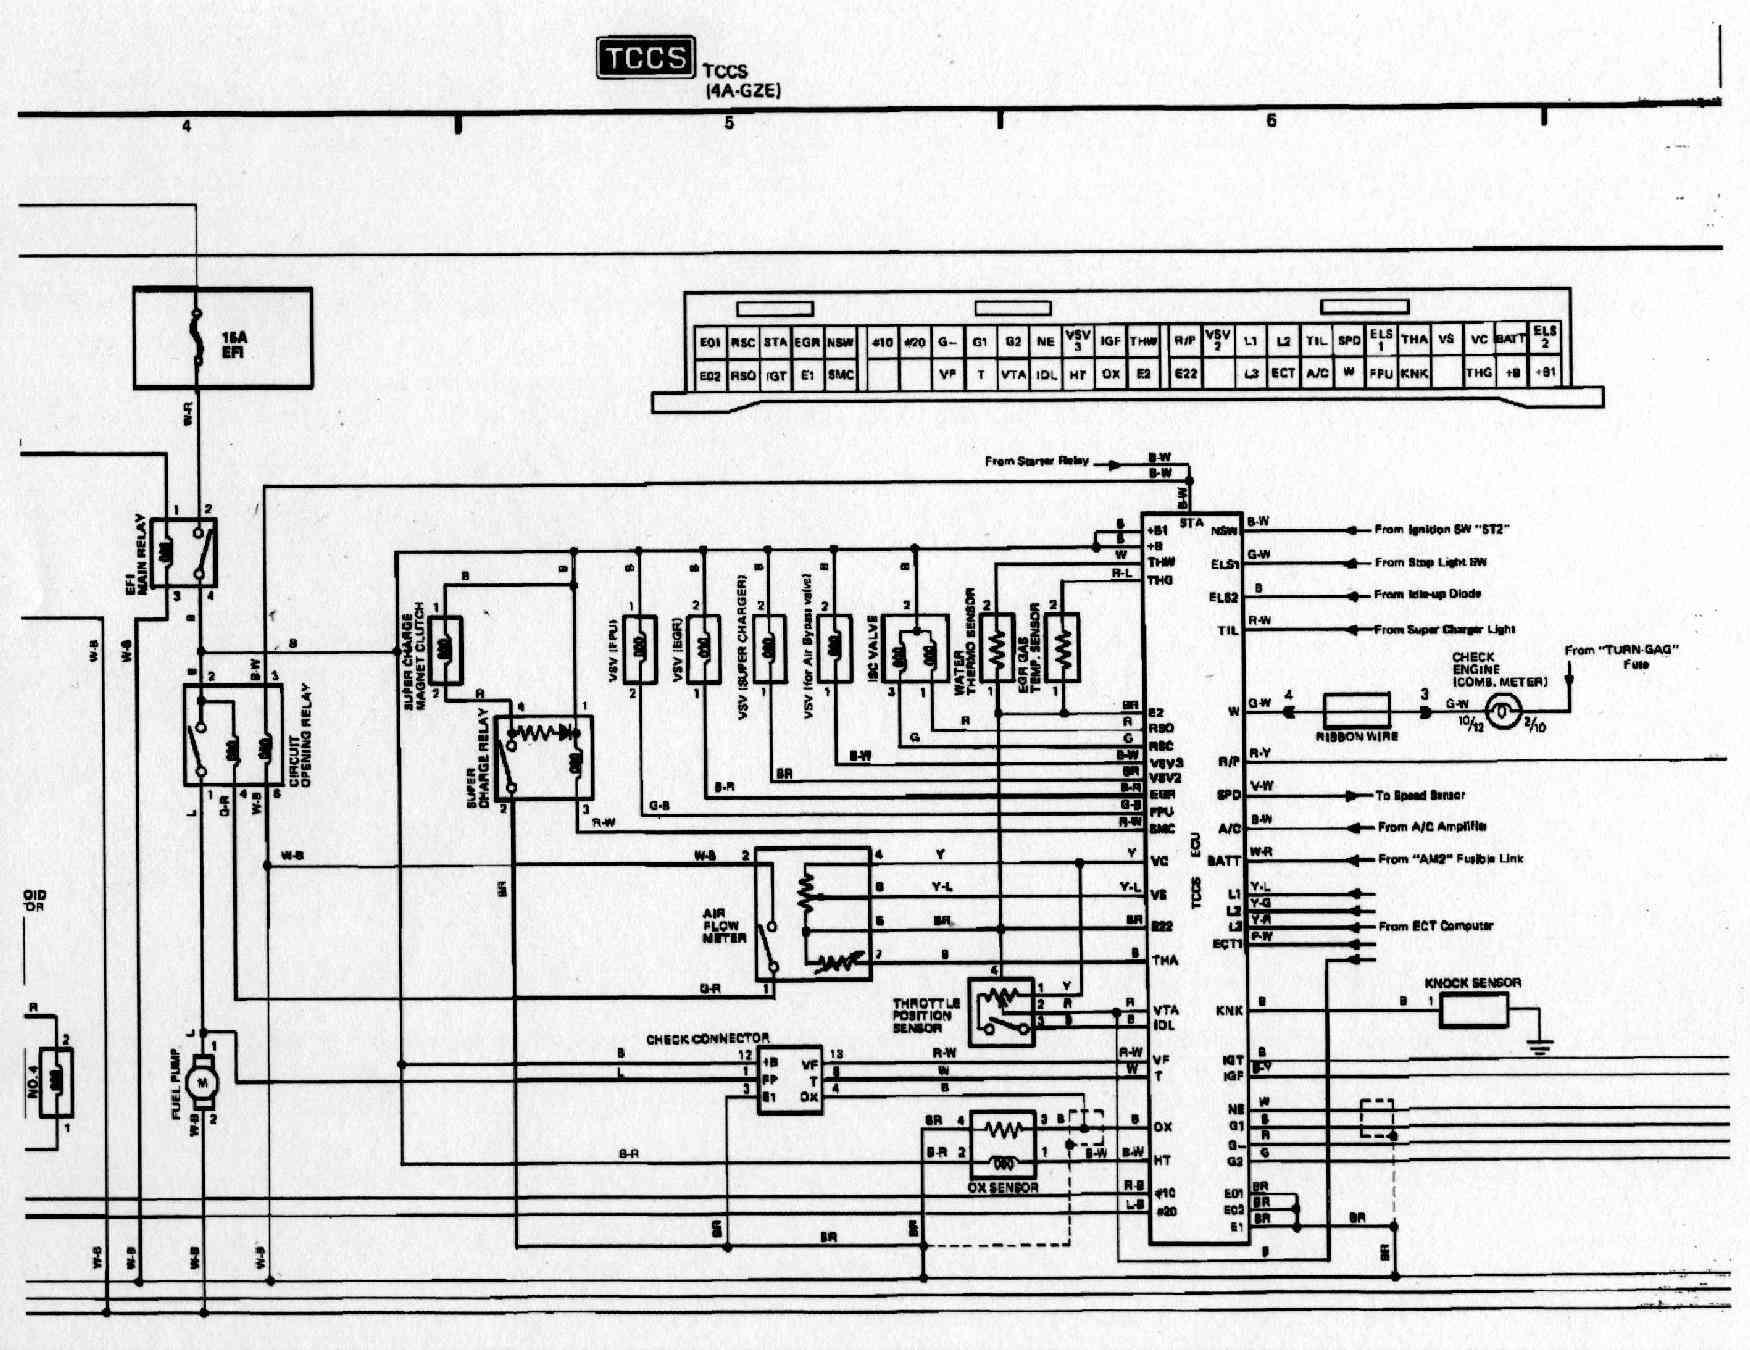 mk1 mr2 fuse diagram tm schwabenschamanen de \u2022 MR2 Spyder mr2 aw11 wiring harness trusted wiring diagram online rh 1 7 10 mf home factory de